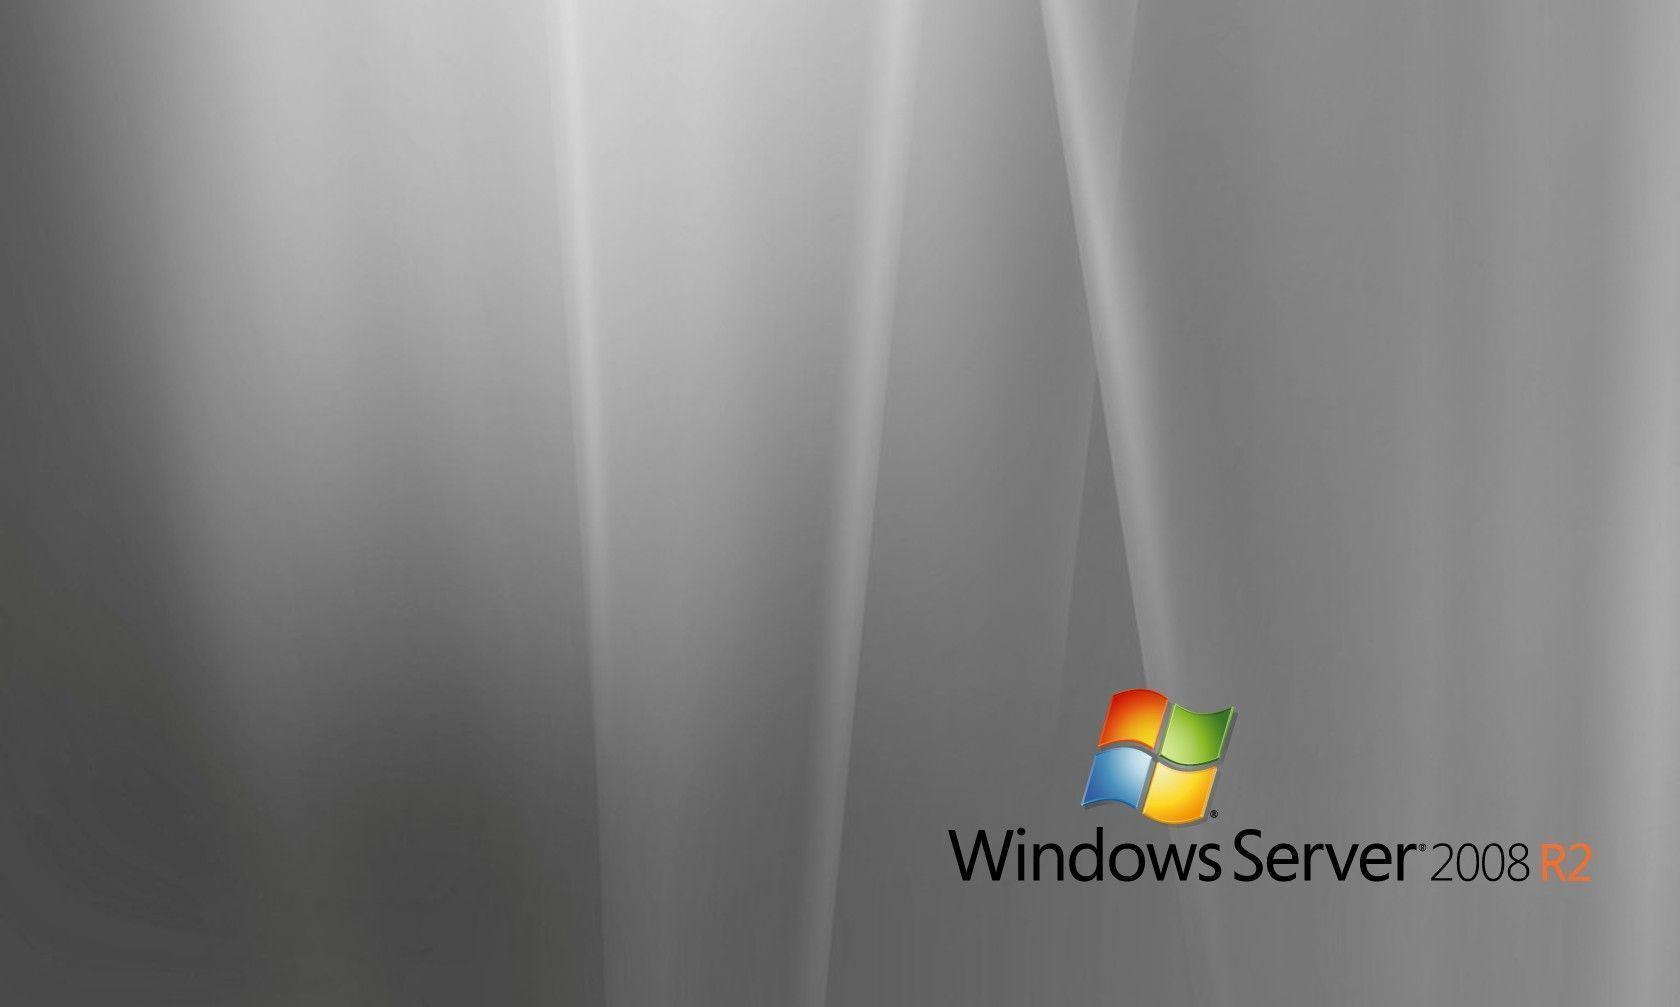 Windows server 2008 unleashed it 24-7 robot ❤ 4k hd desktop.